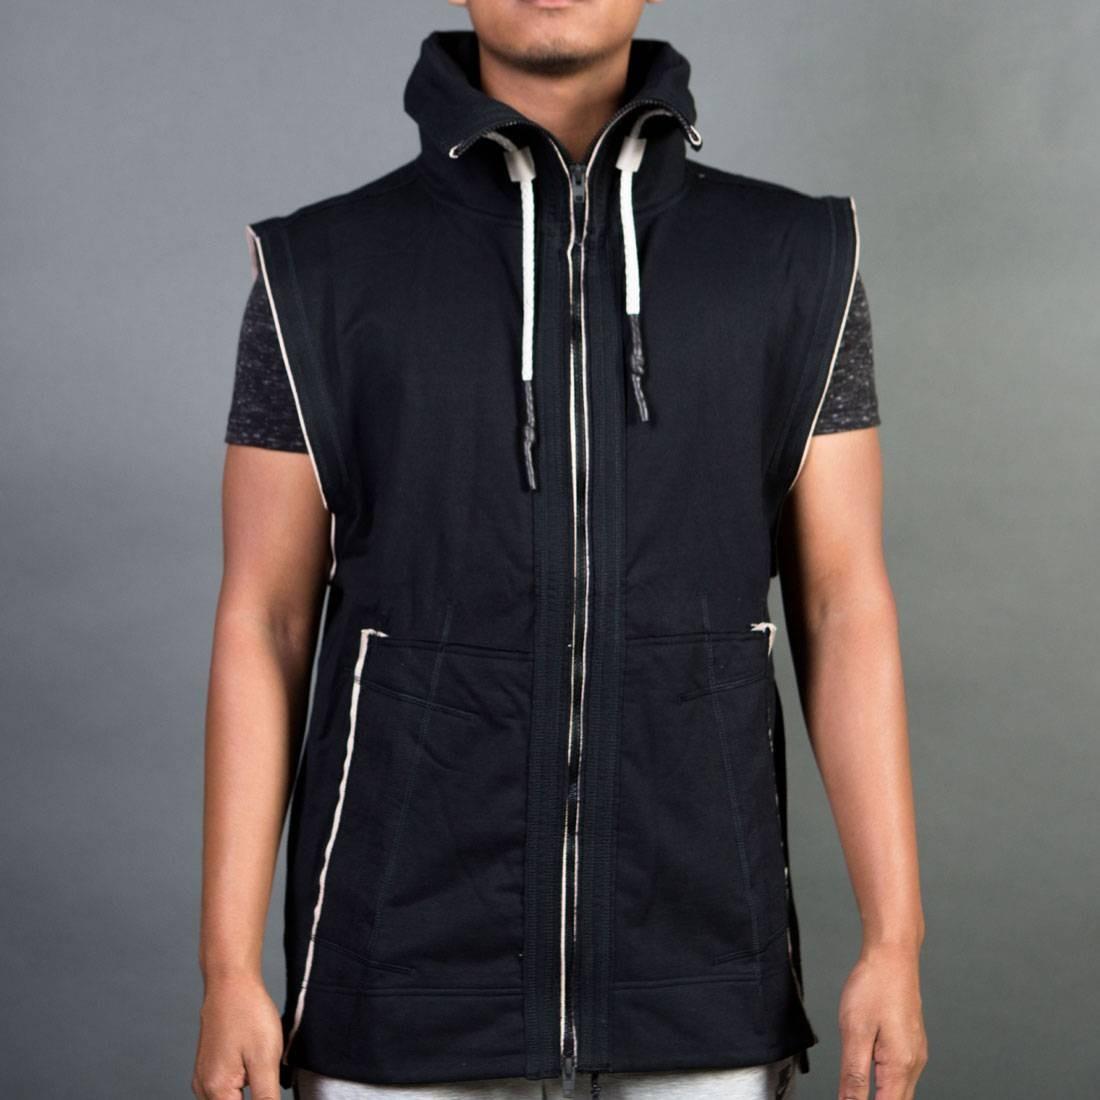 Adidas Consortium Day One Men Sleeveless Tracktop Jacket (black / peyote)